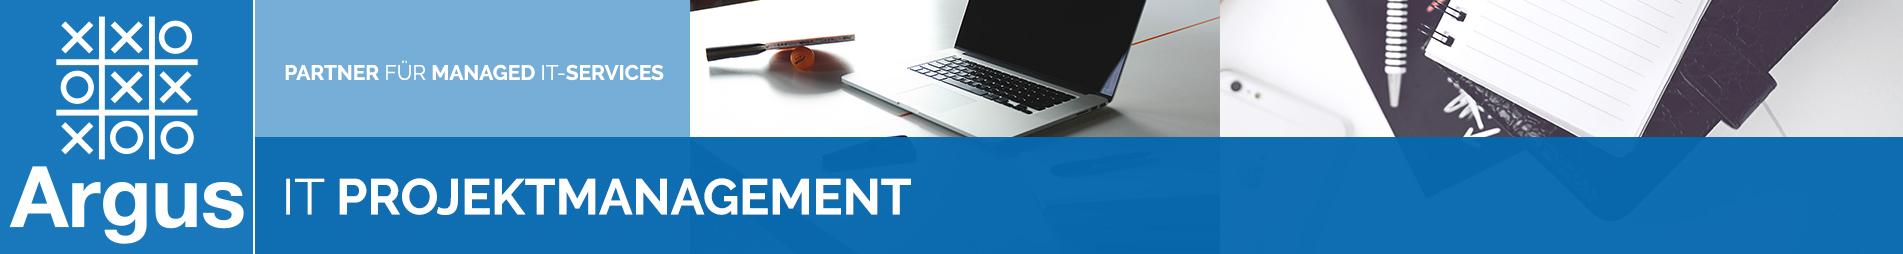 unterkachelbild-it-projektmanagement_logo_links